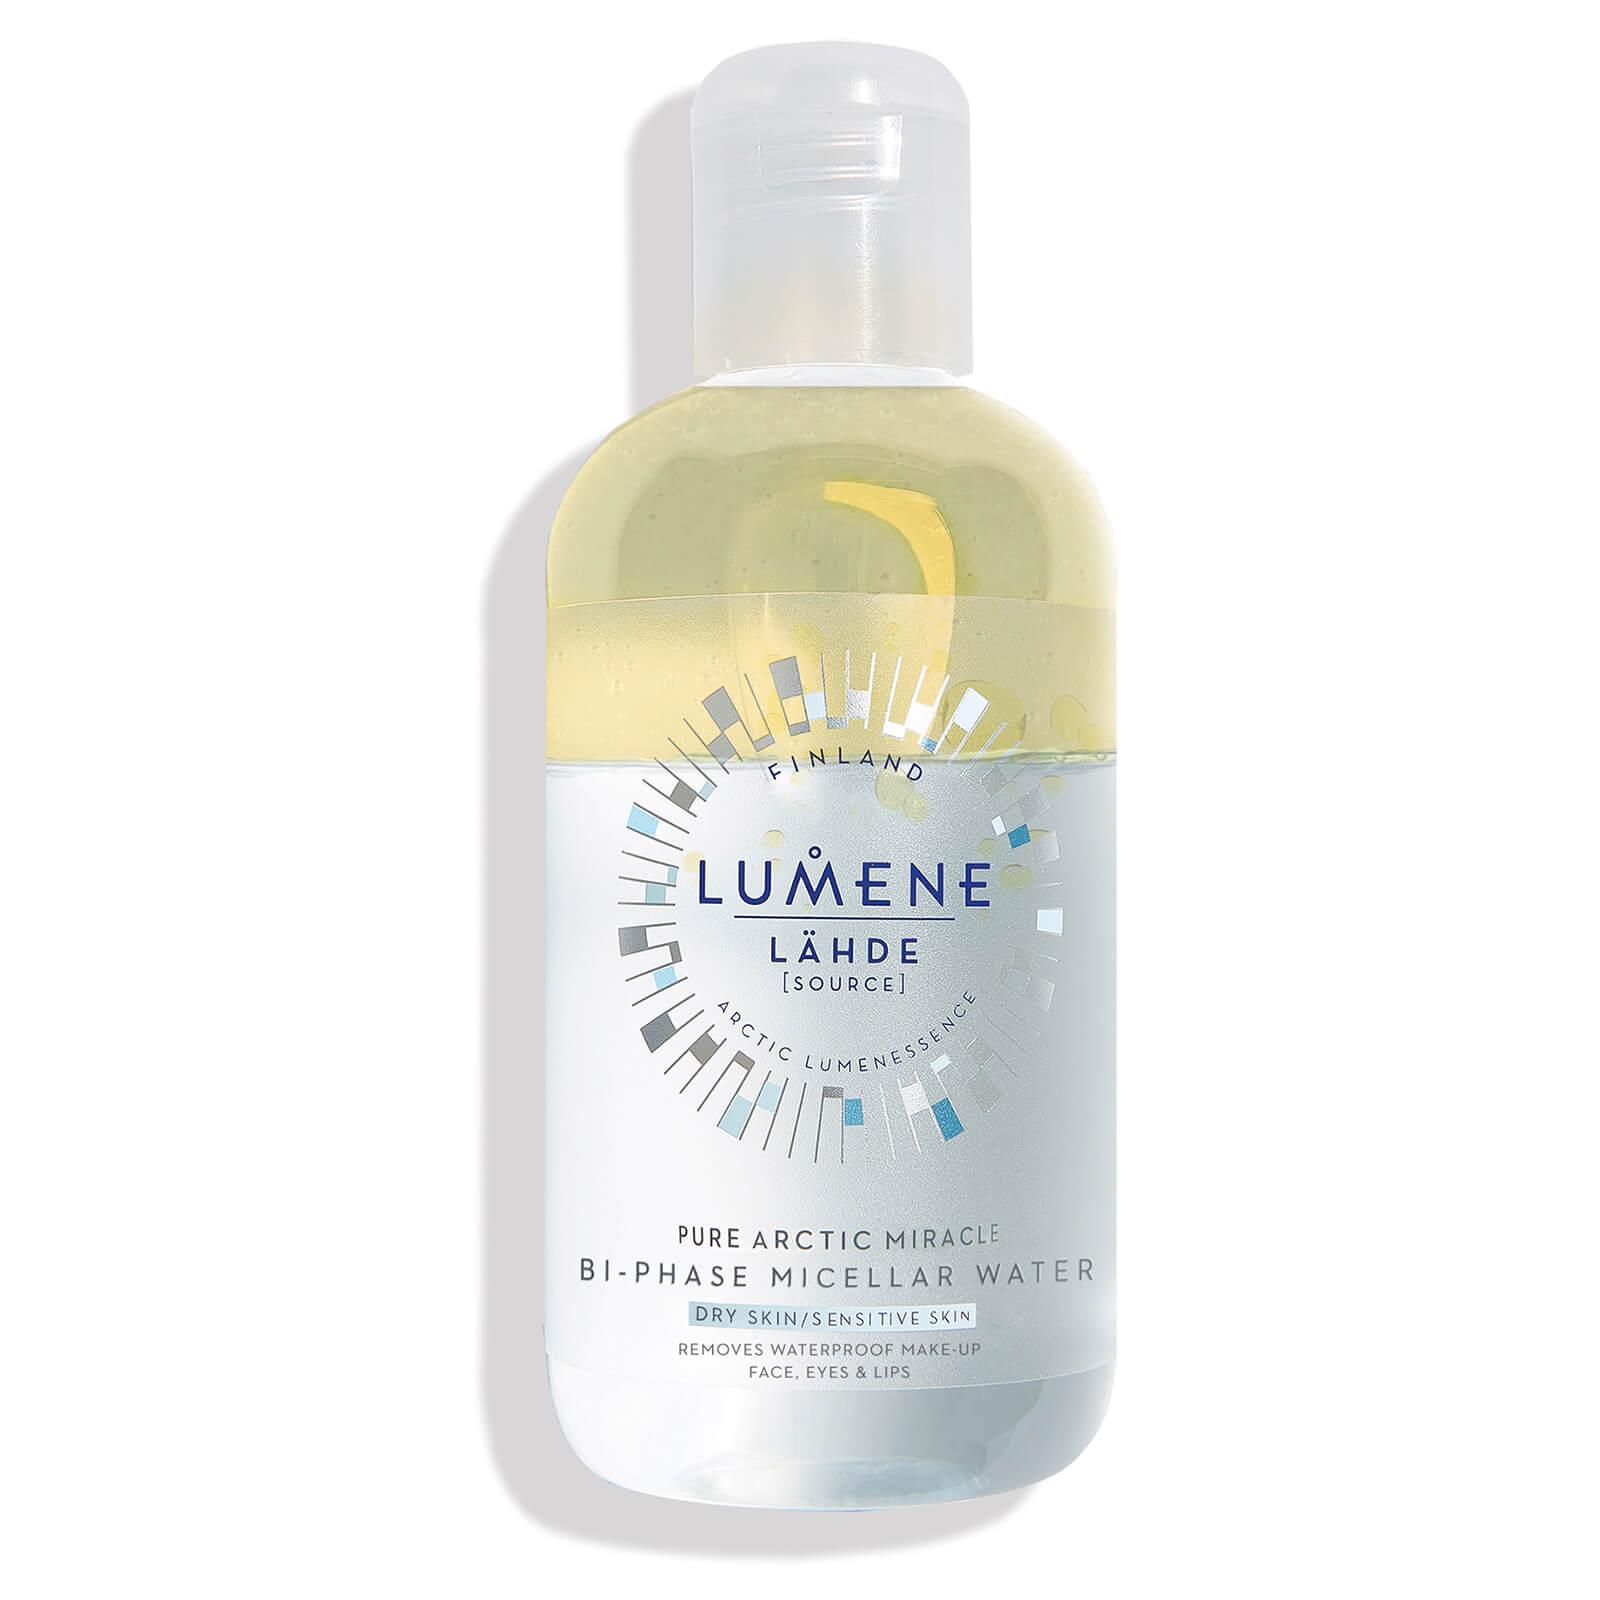 Купить Lumene Nordic Hydra [Lähde] Pure Arctic Miracle Bi-Phase Micellar Water 250ml